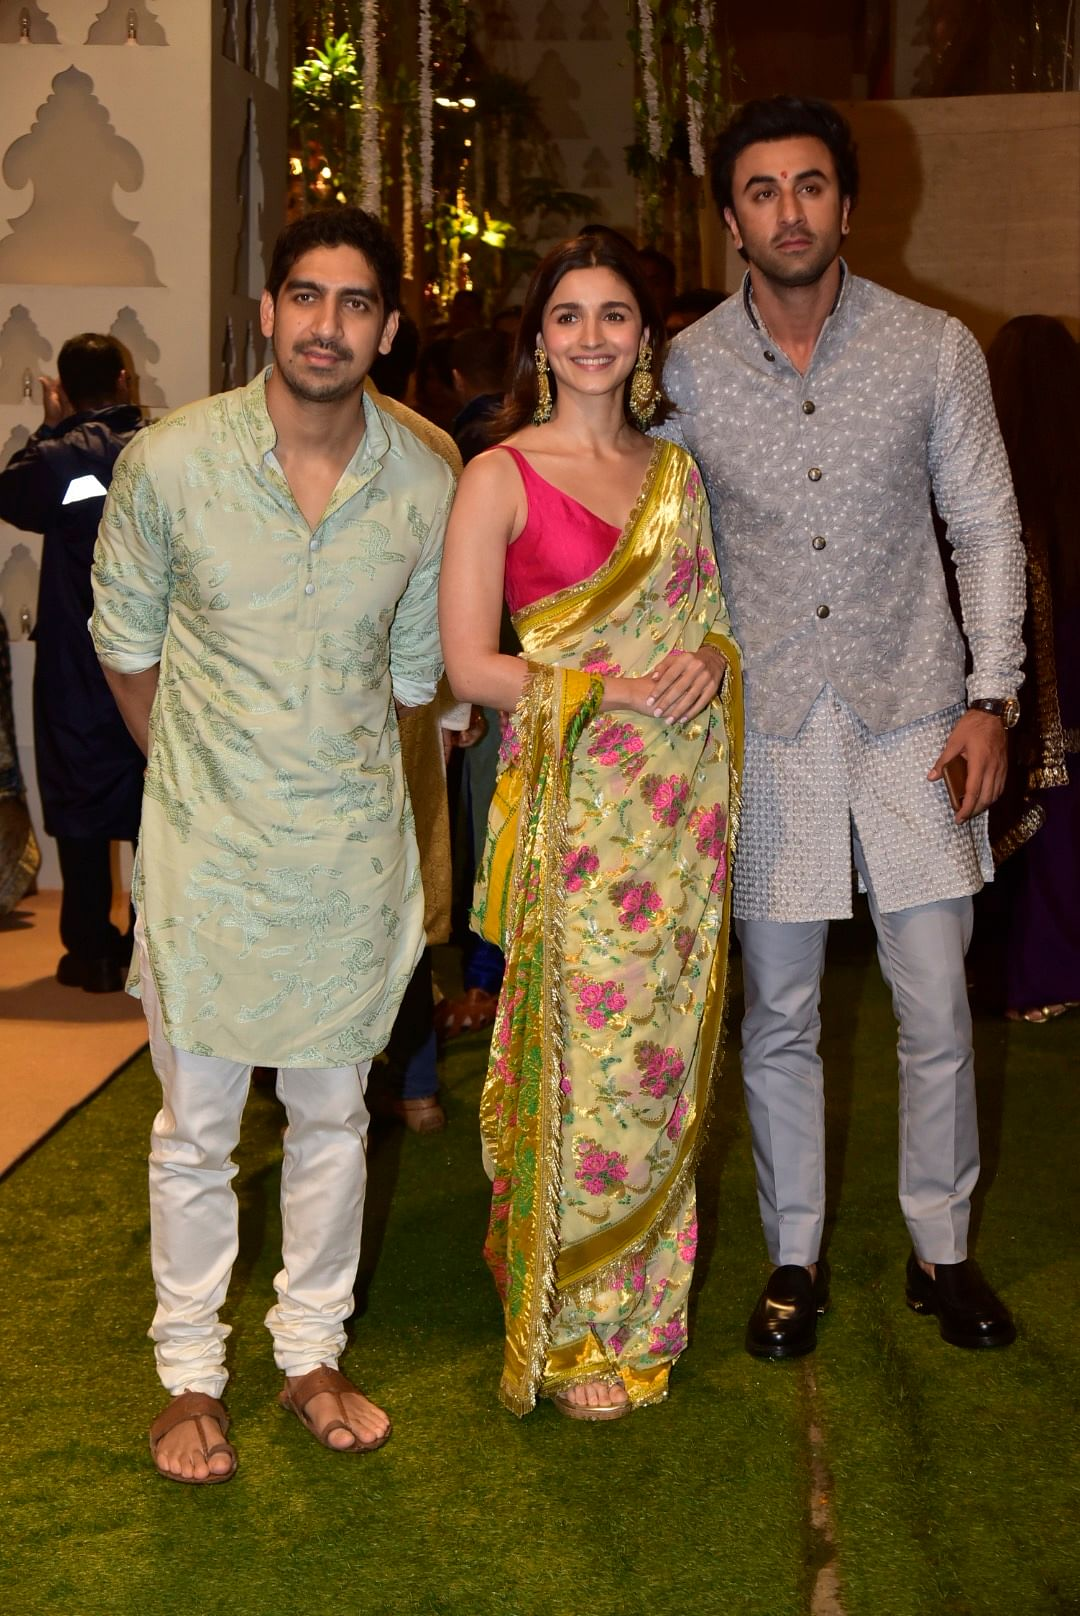 Brhamastra team, Aayan Mukerji with stars Alia and Ranbir were spotted at Antilia Ganpati celebrations